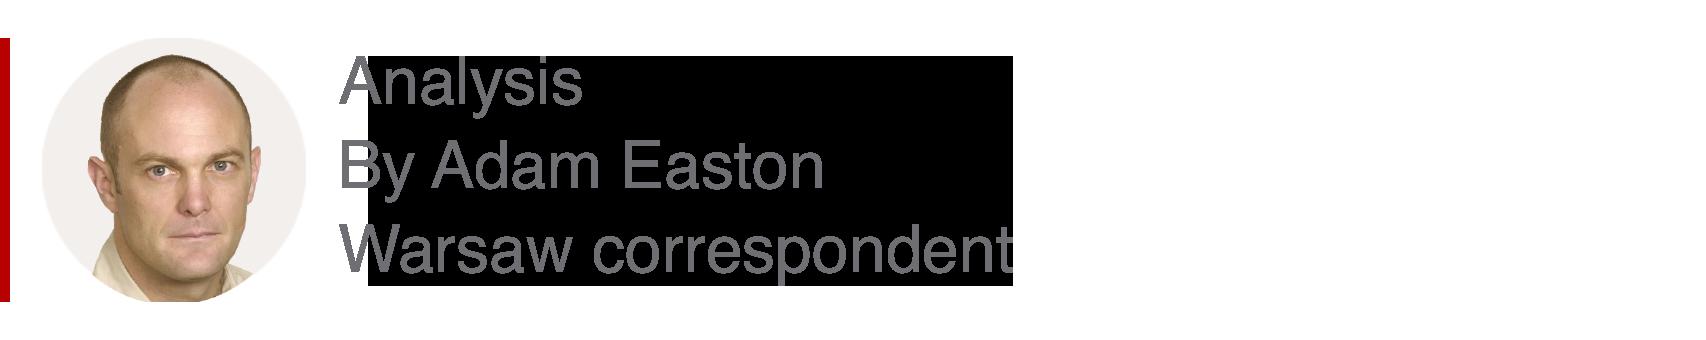 Analysis box by Adam Easton, Warsaw correspondent